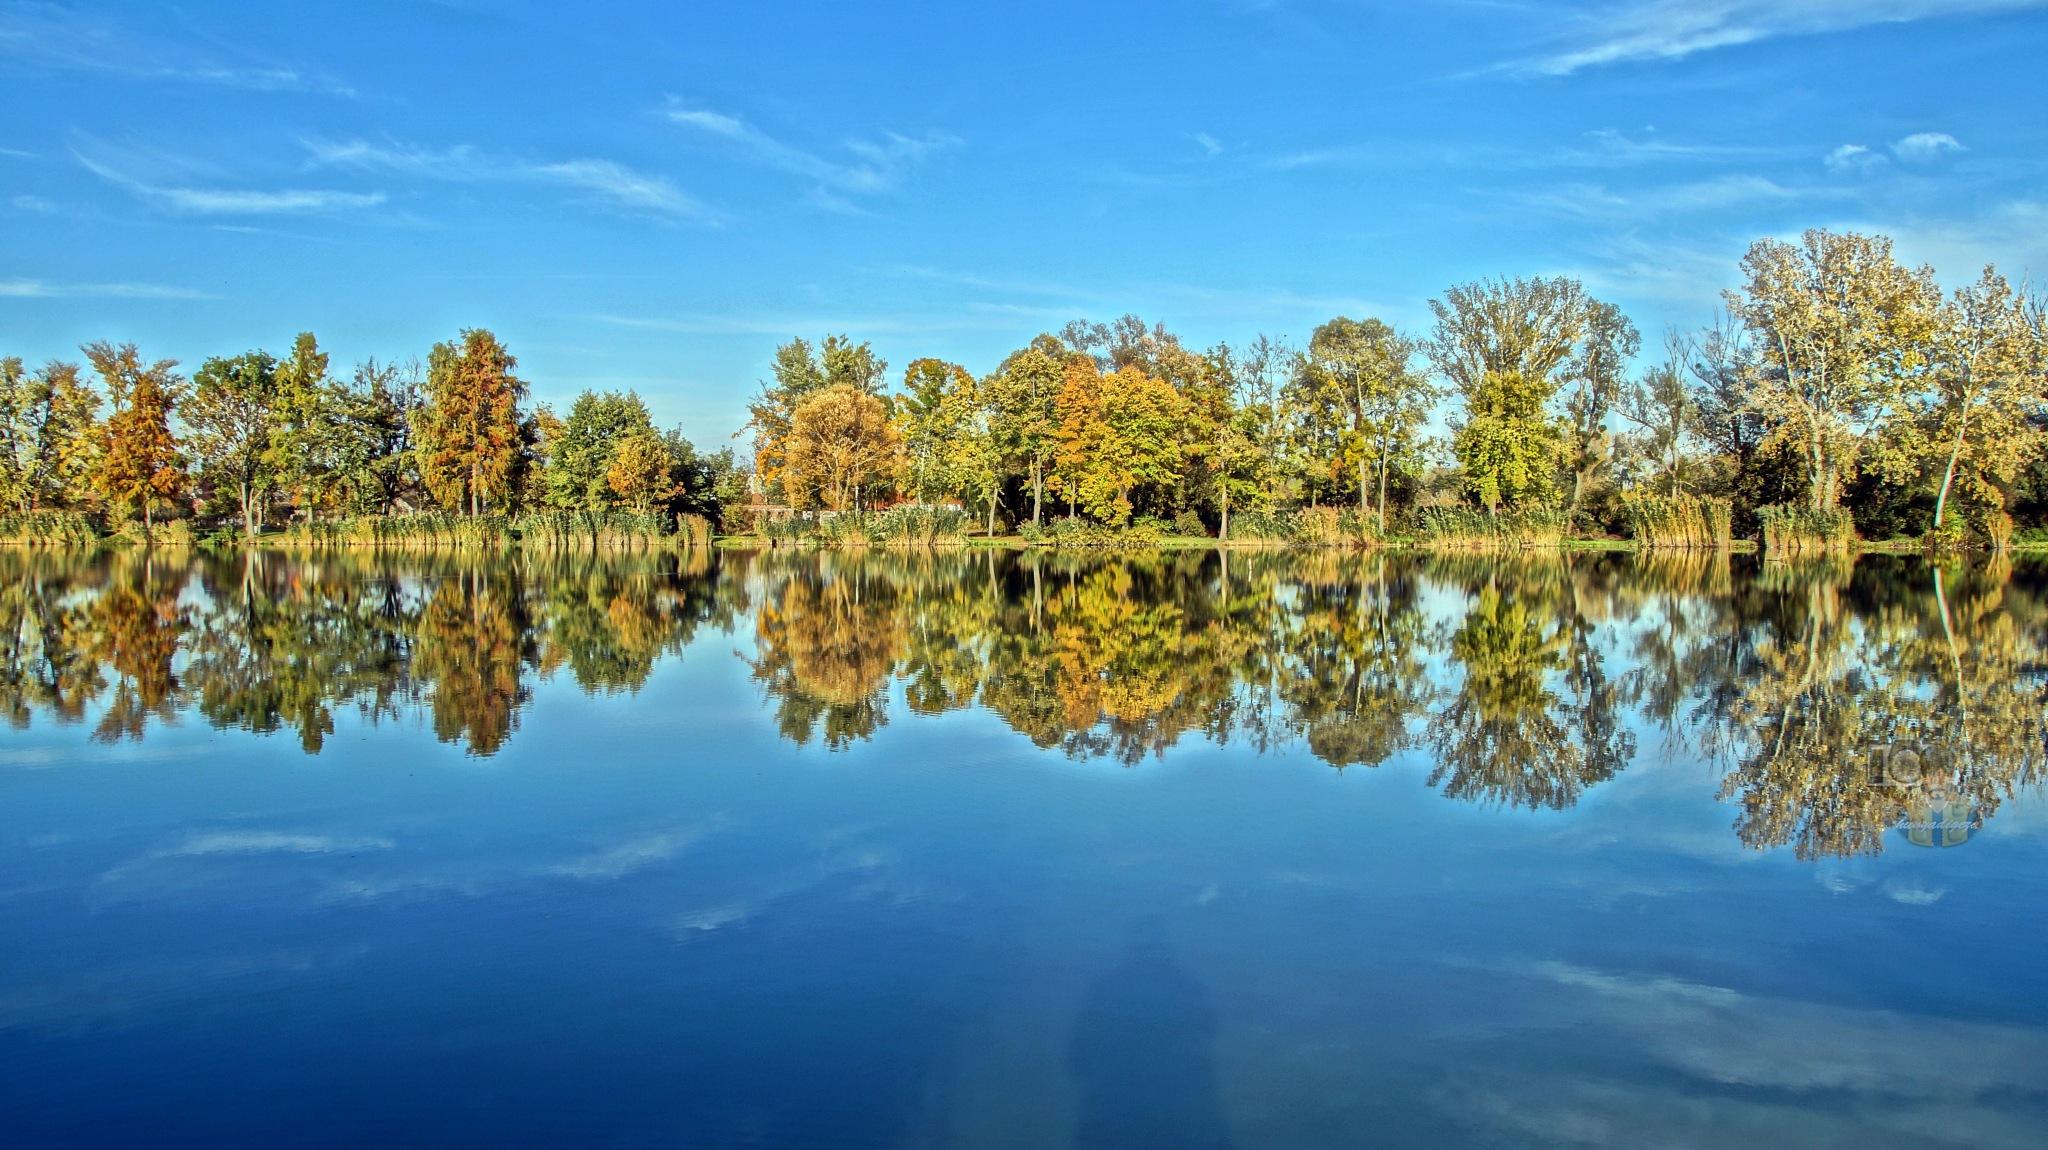 Oct.18, autumn in city park #8 HDR by hunyadigeza